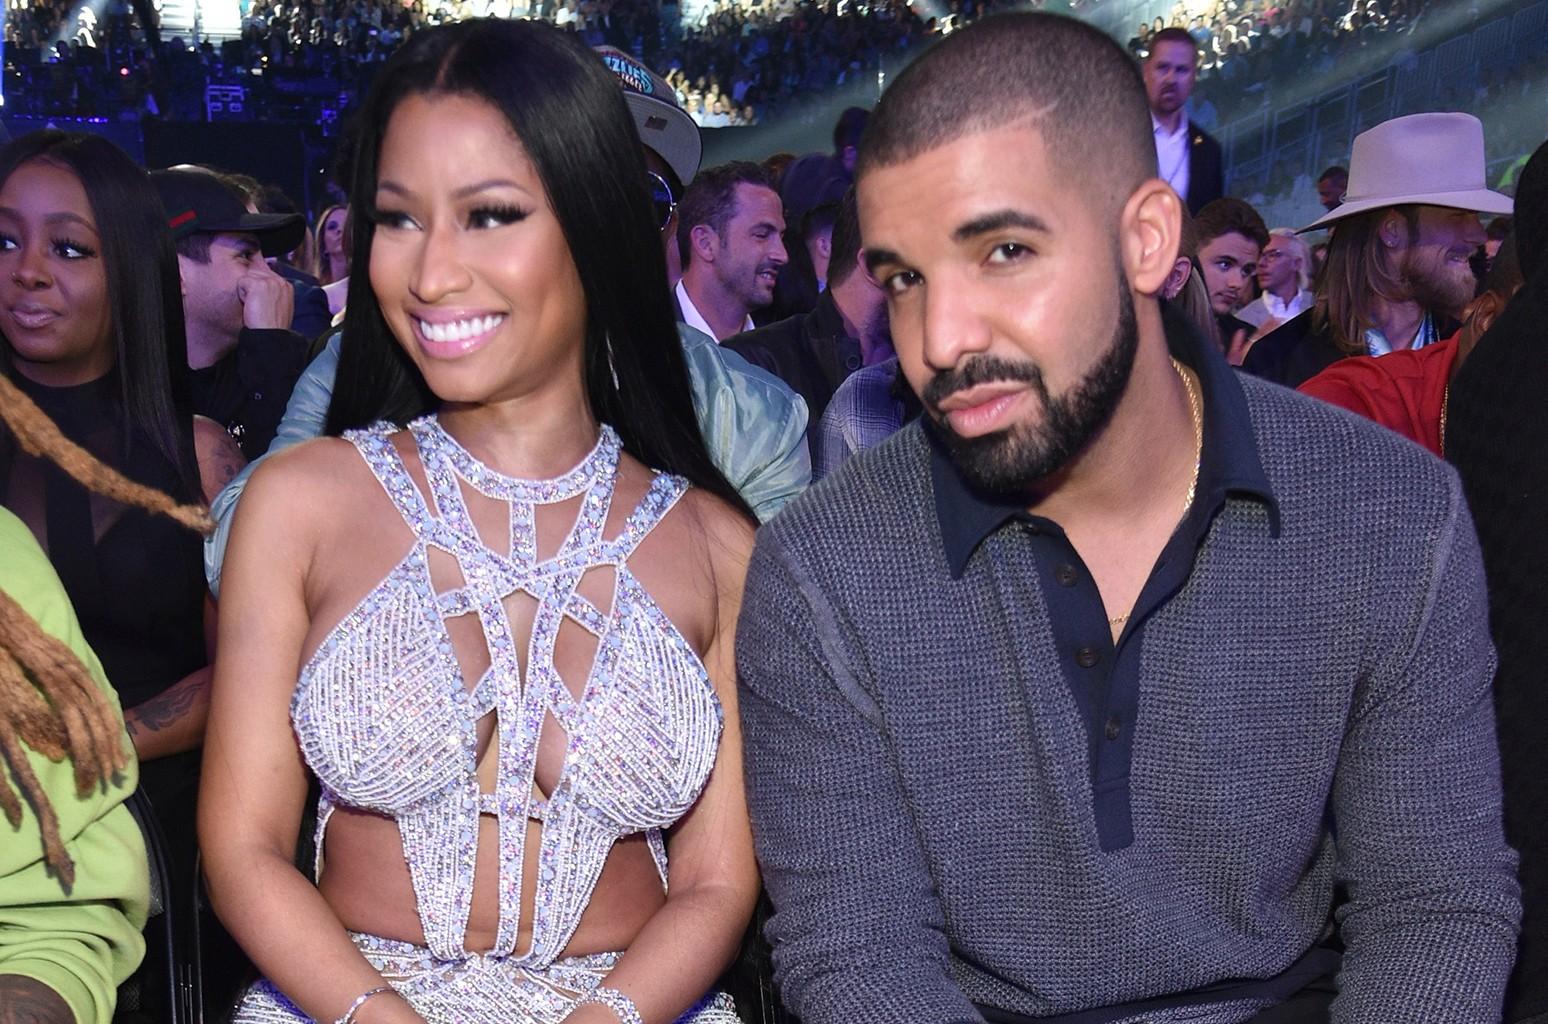 Nicki Minaj and Drake attend the 2017 Billboard Music Awards at T-Mobile Arena on May 21, 2017 in Las Vegas.